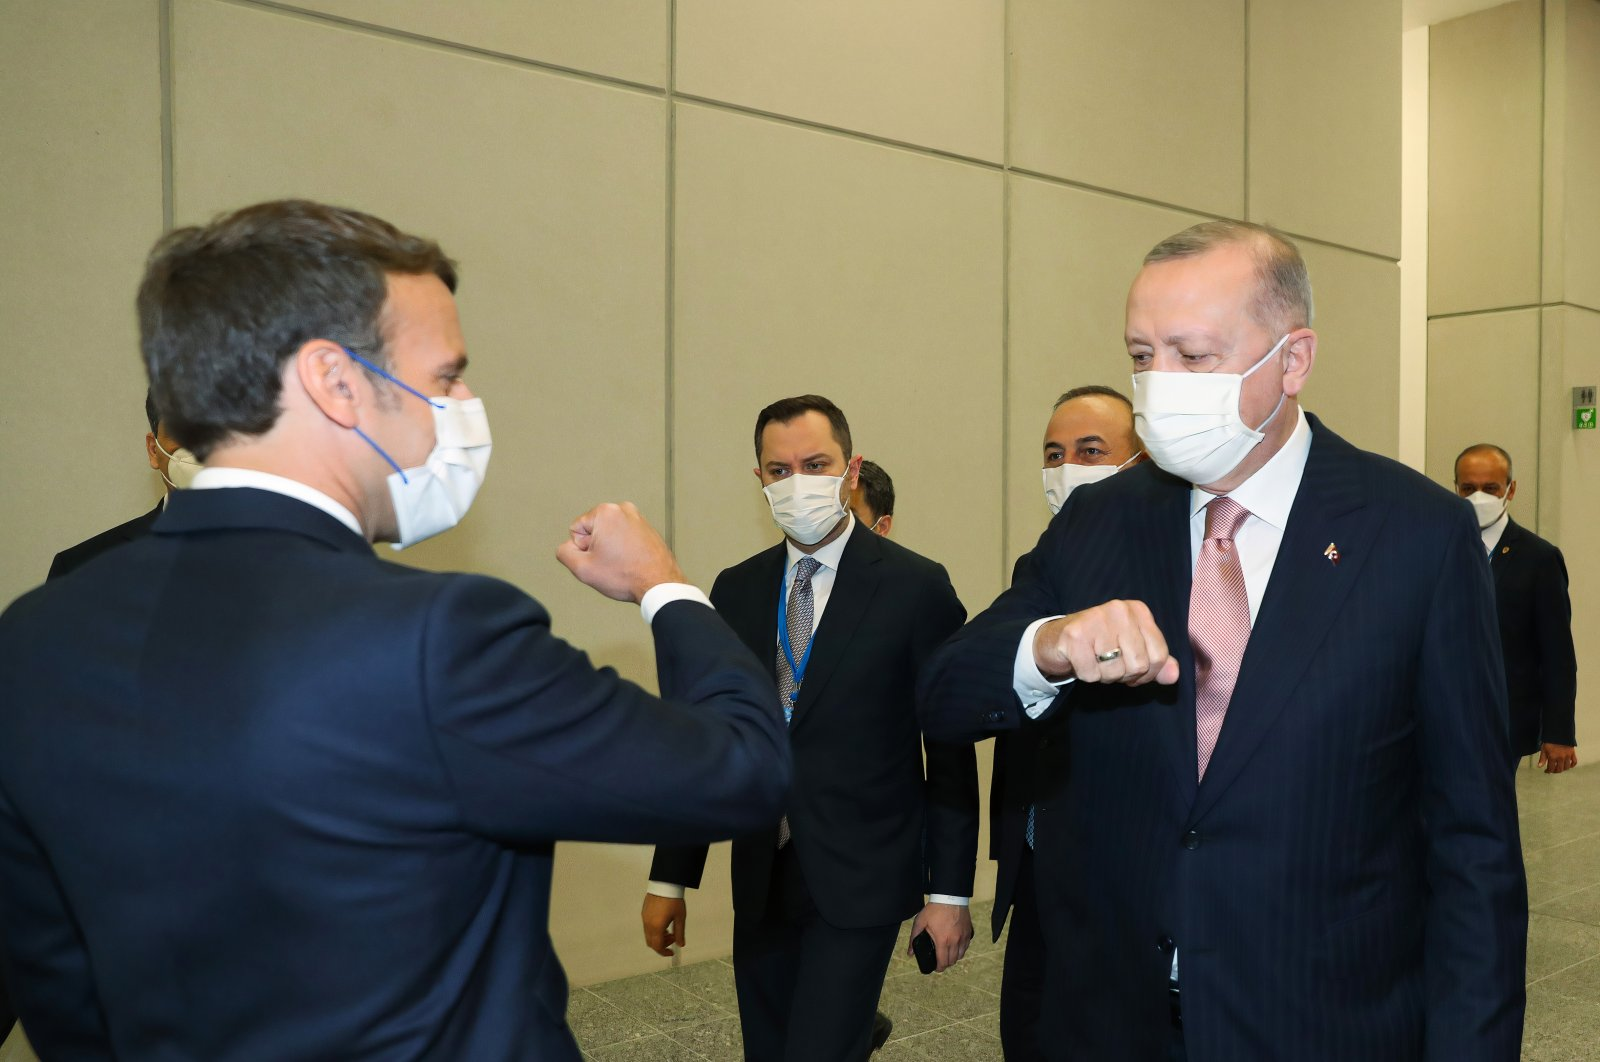 President Recep Tayyip Erdoğan and French President Emmanuel Macron gesture at the NATO summit in Brussels, Belgium, June 14, 2021. (IHA Photo)